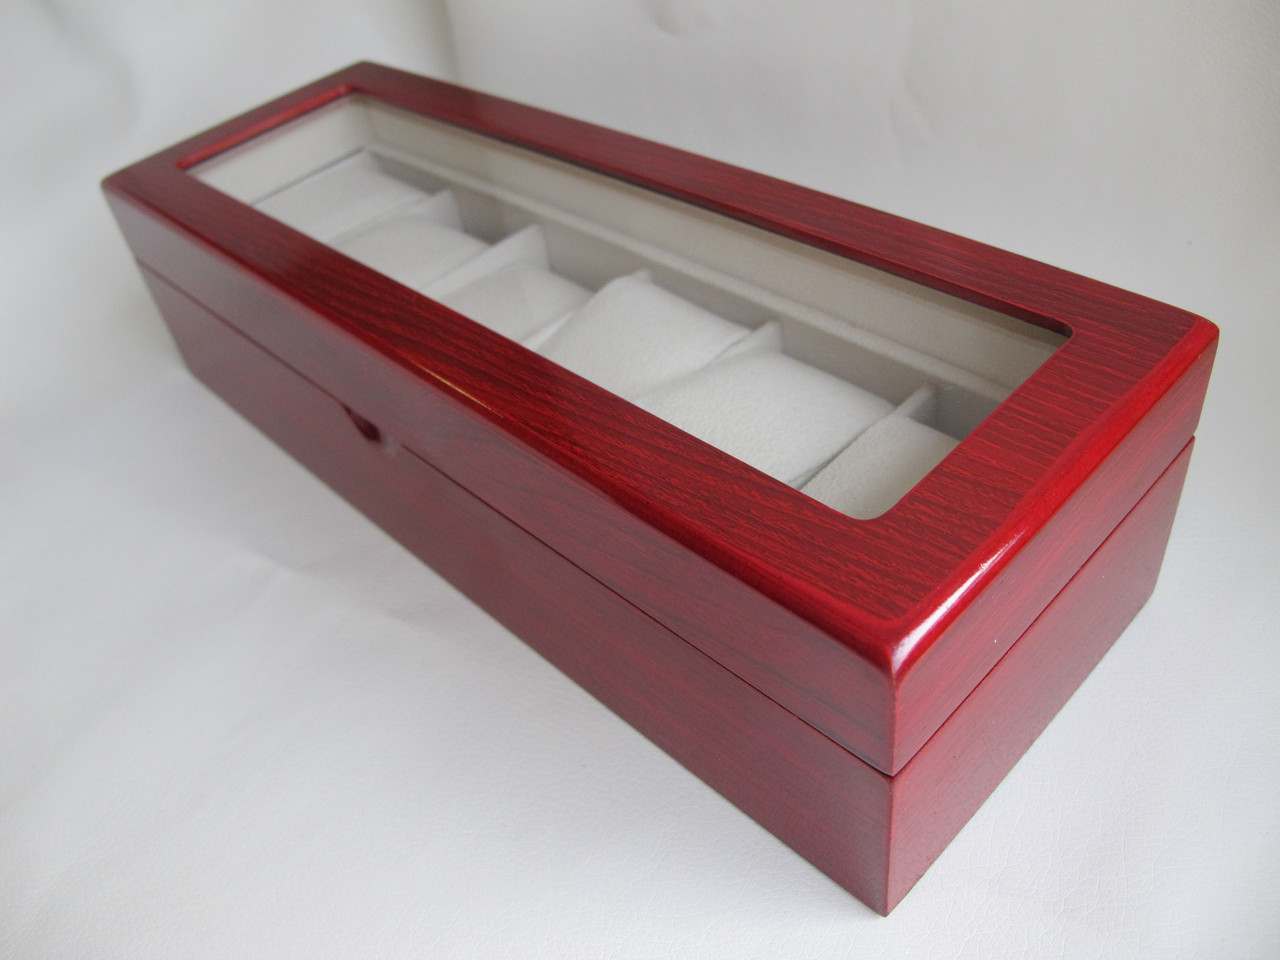 Шкатулка для хранения часов Craft 6WB.RED